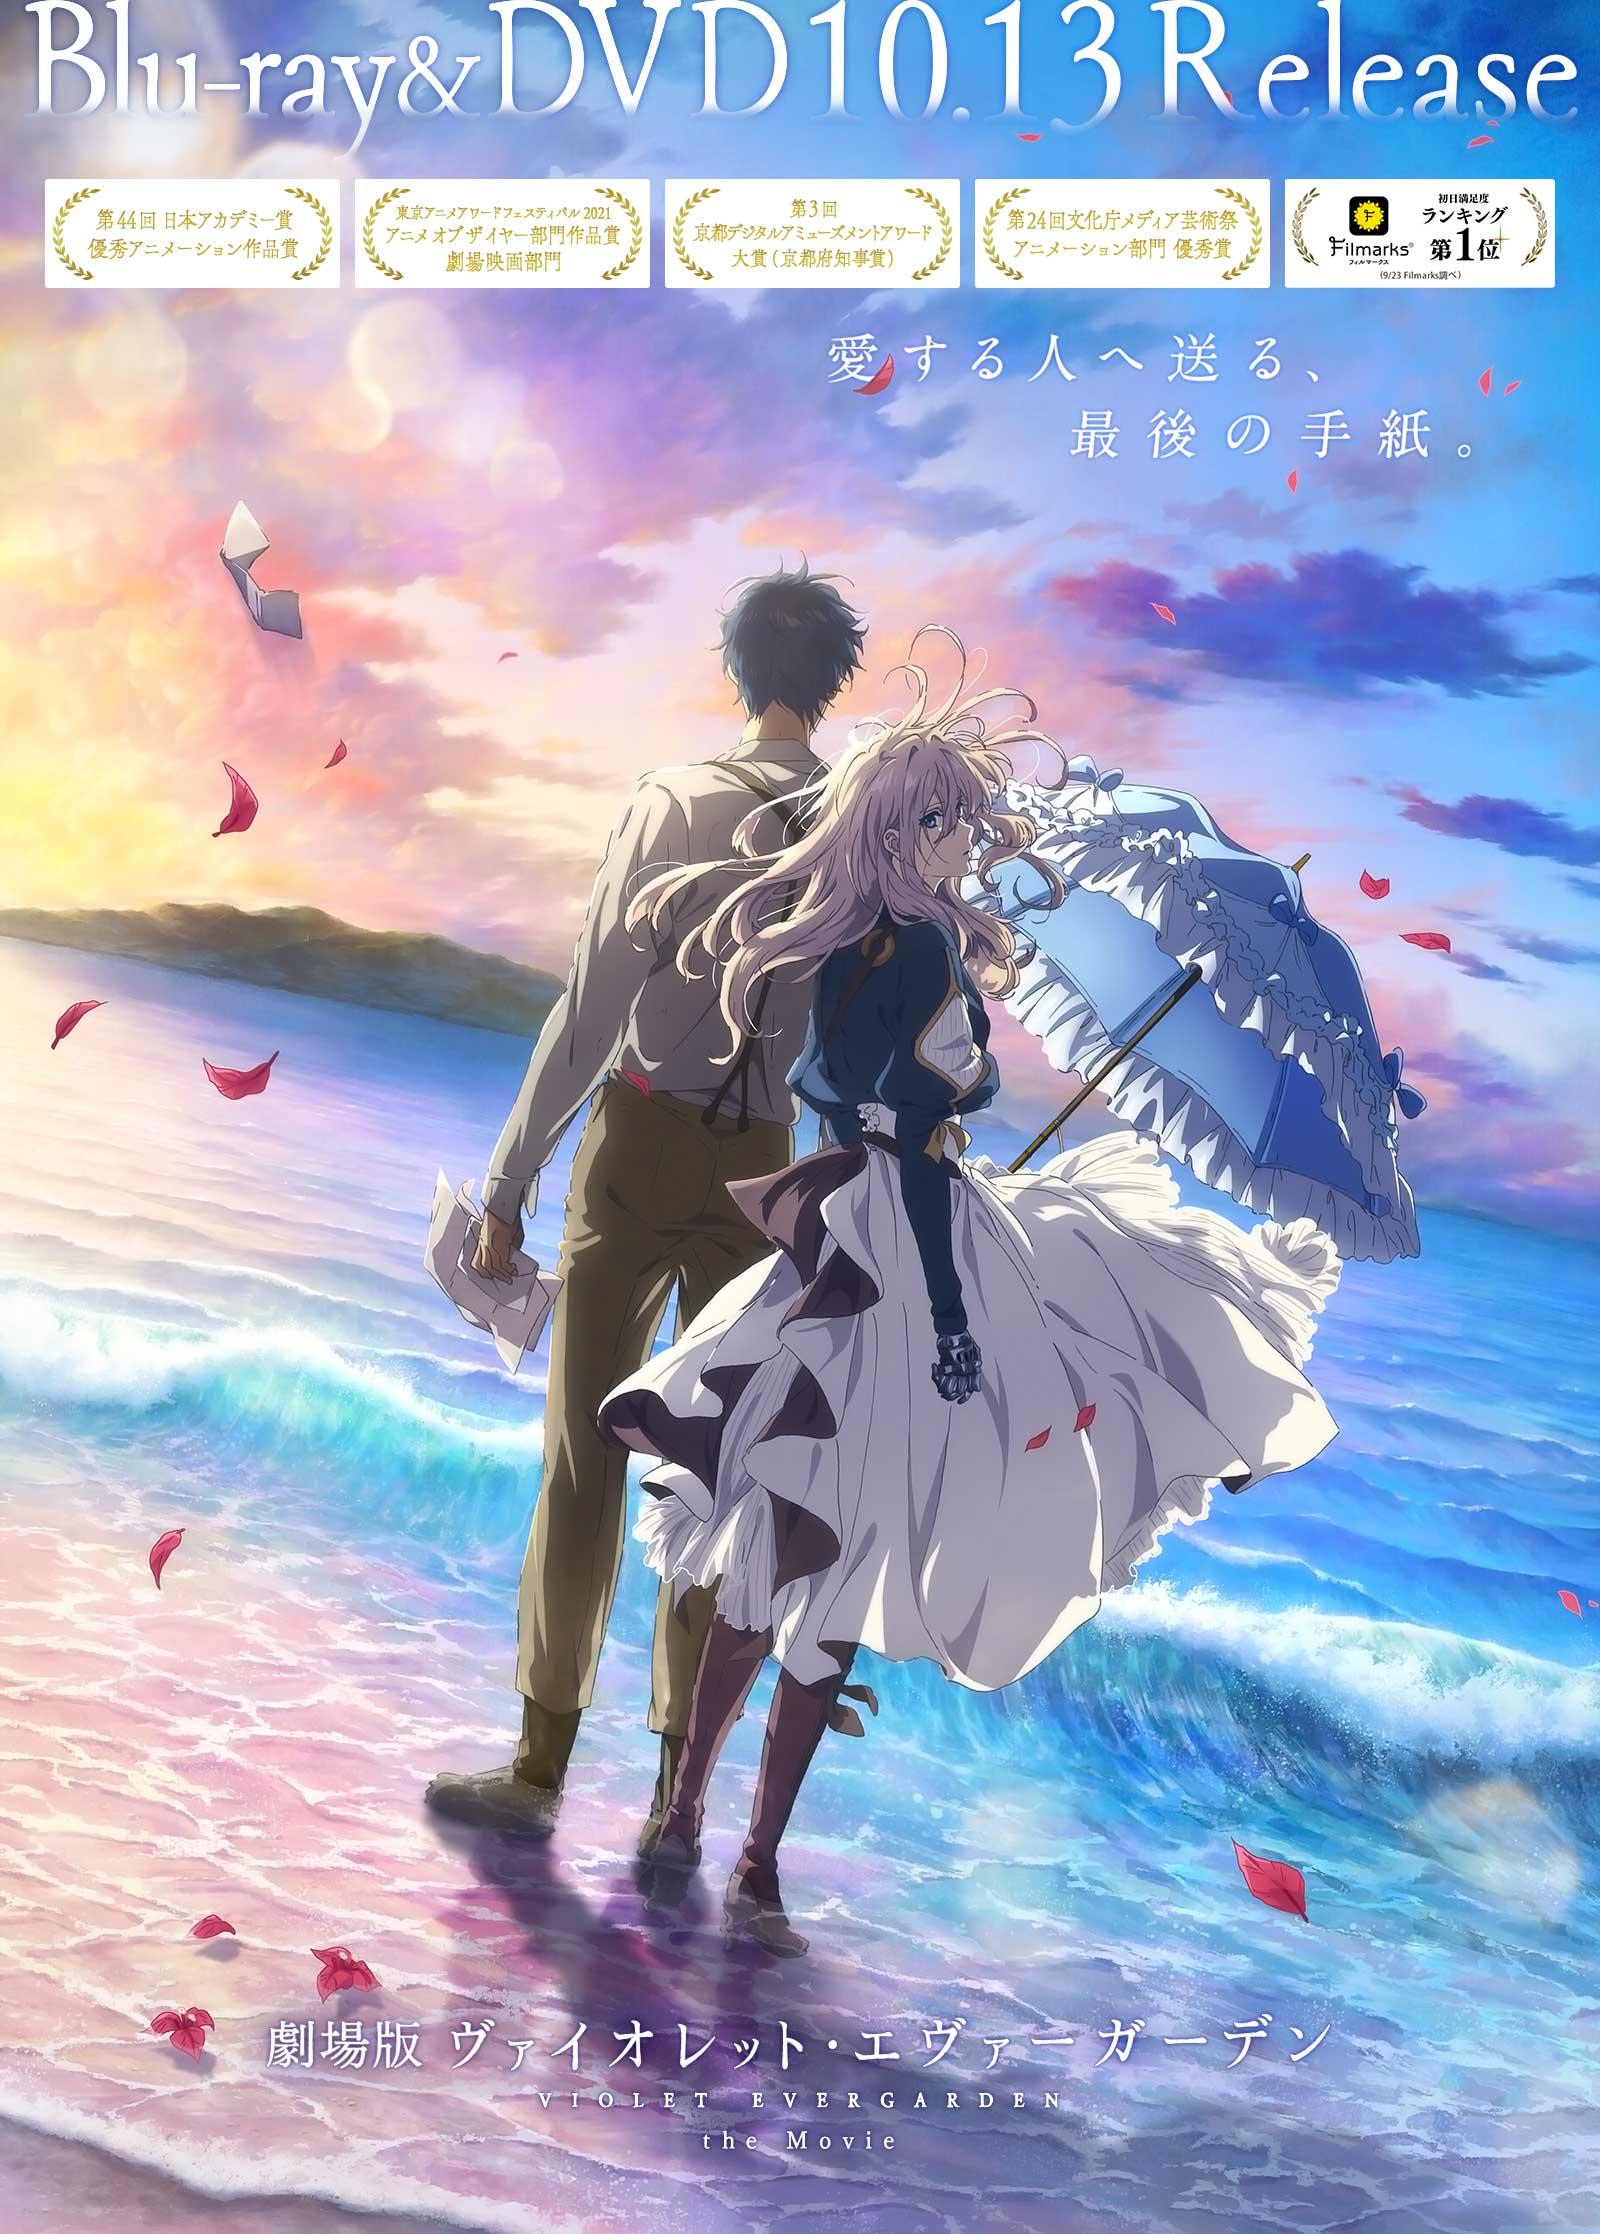 Kyoto Animation - Violet Evergarden The Movie 2020